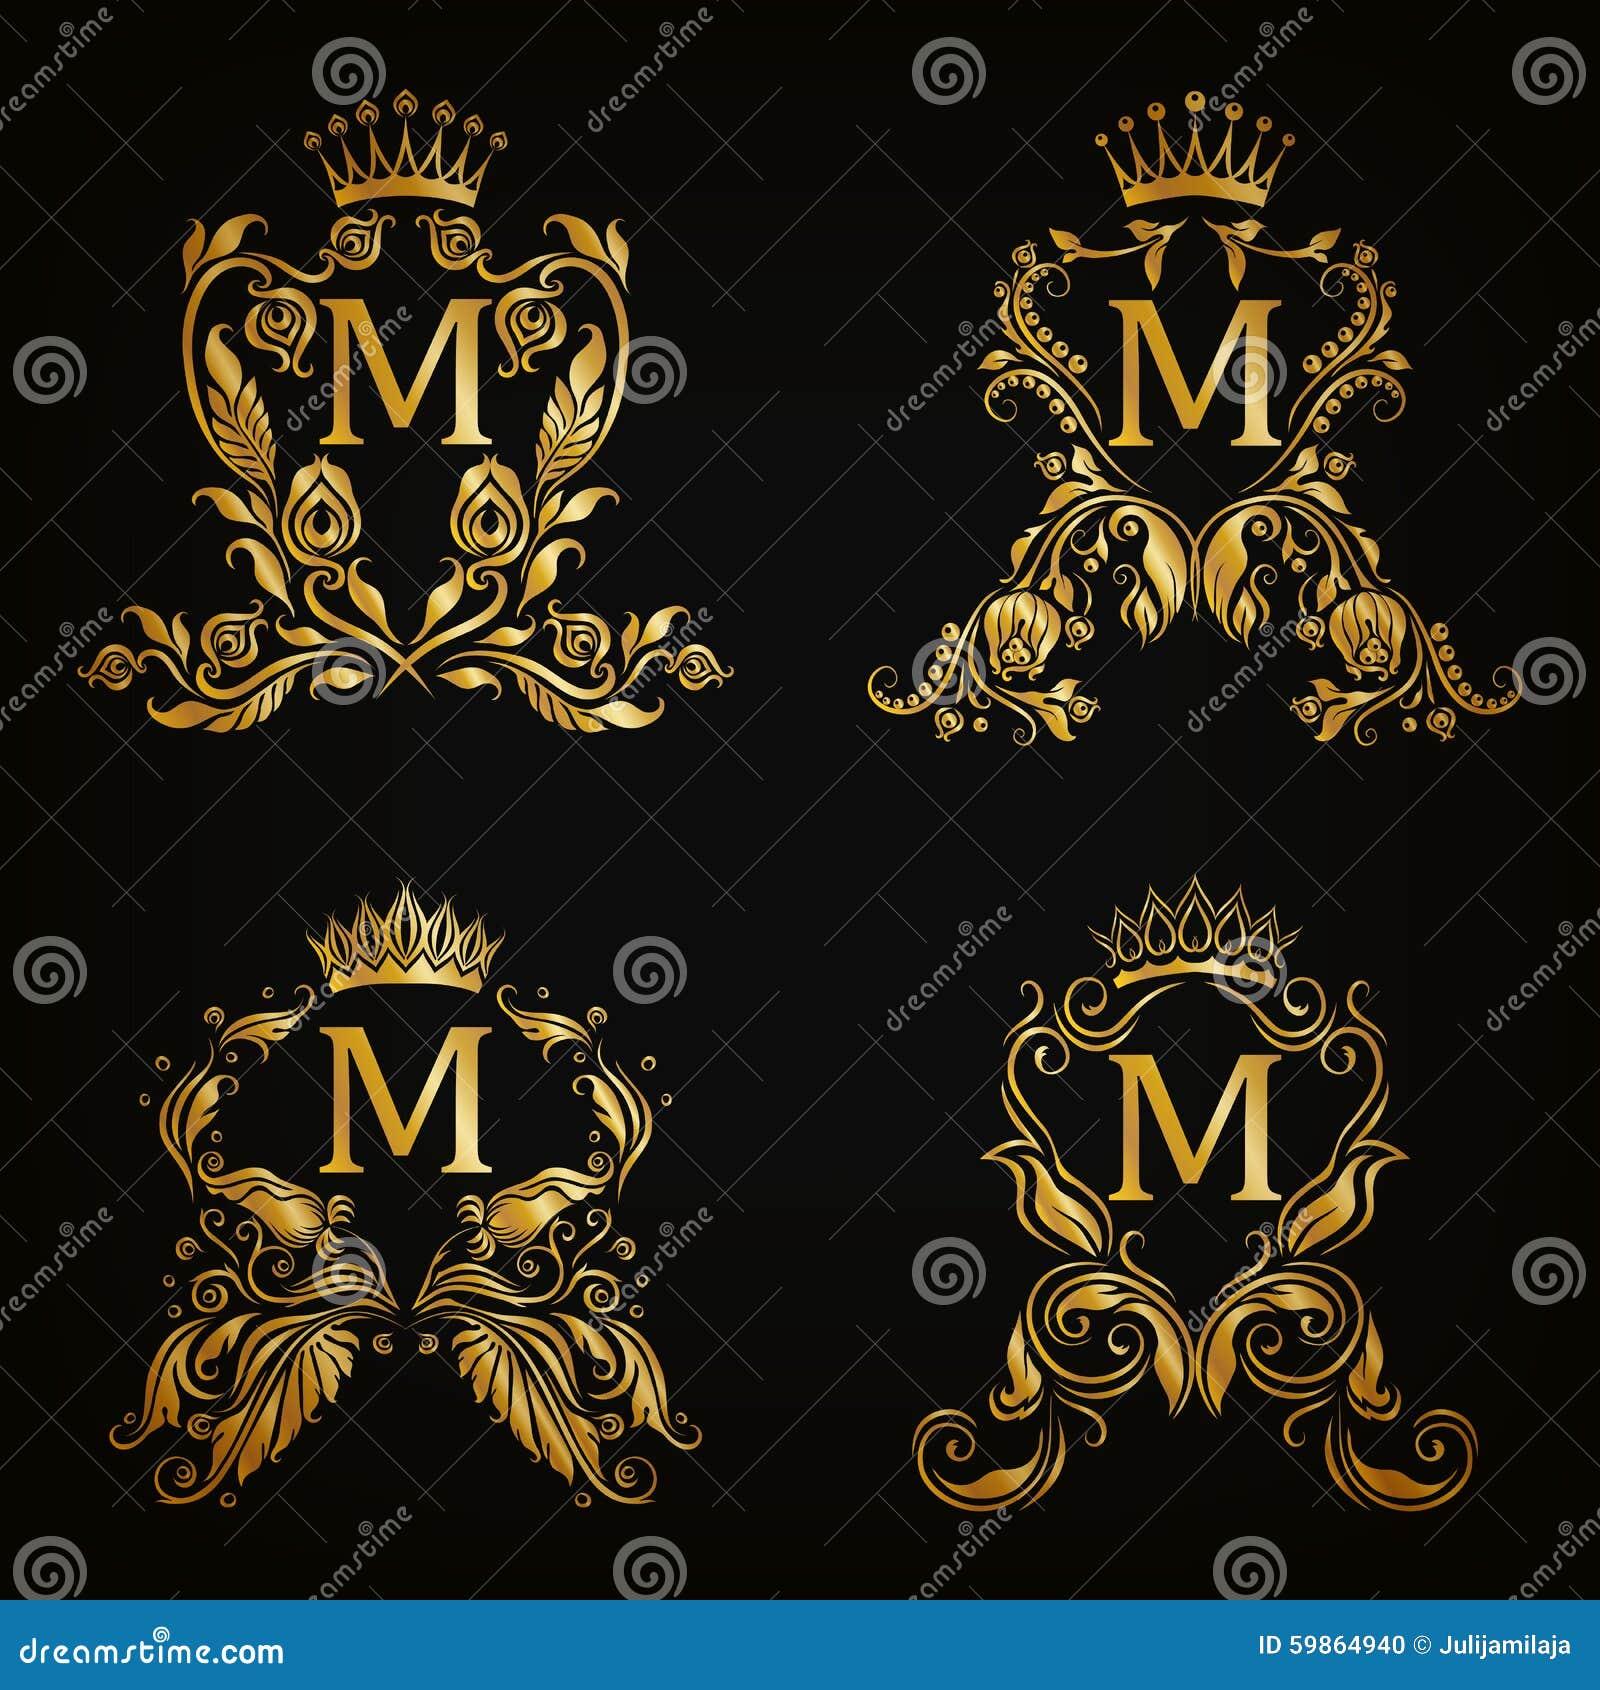 Monogram Logos Set Stock Vector